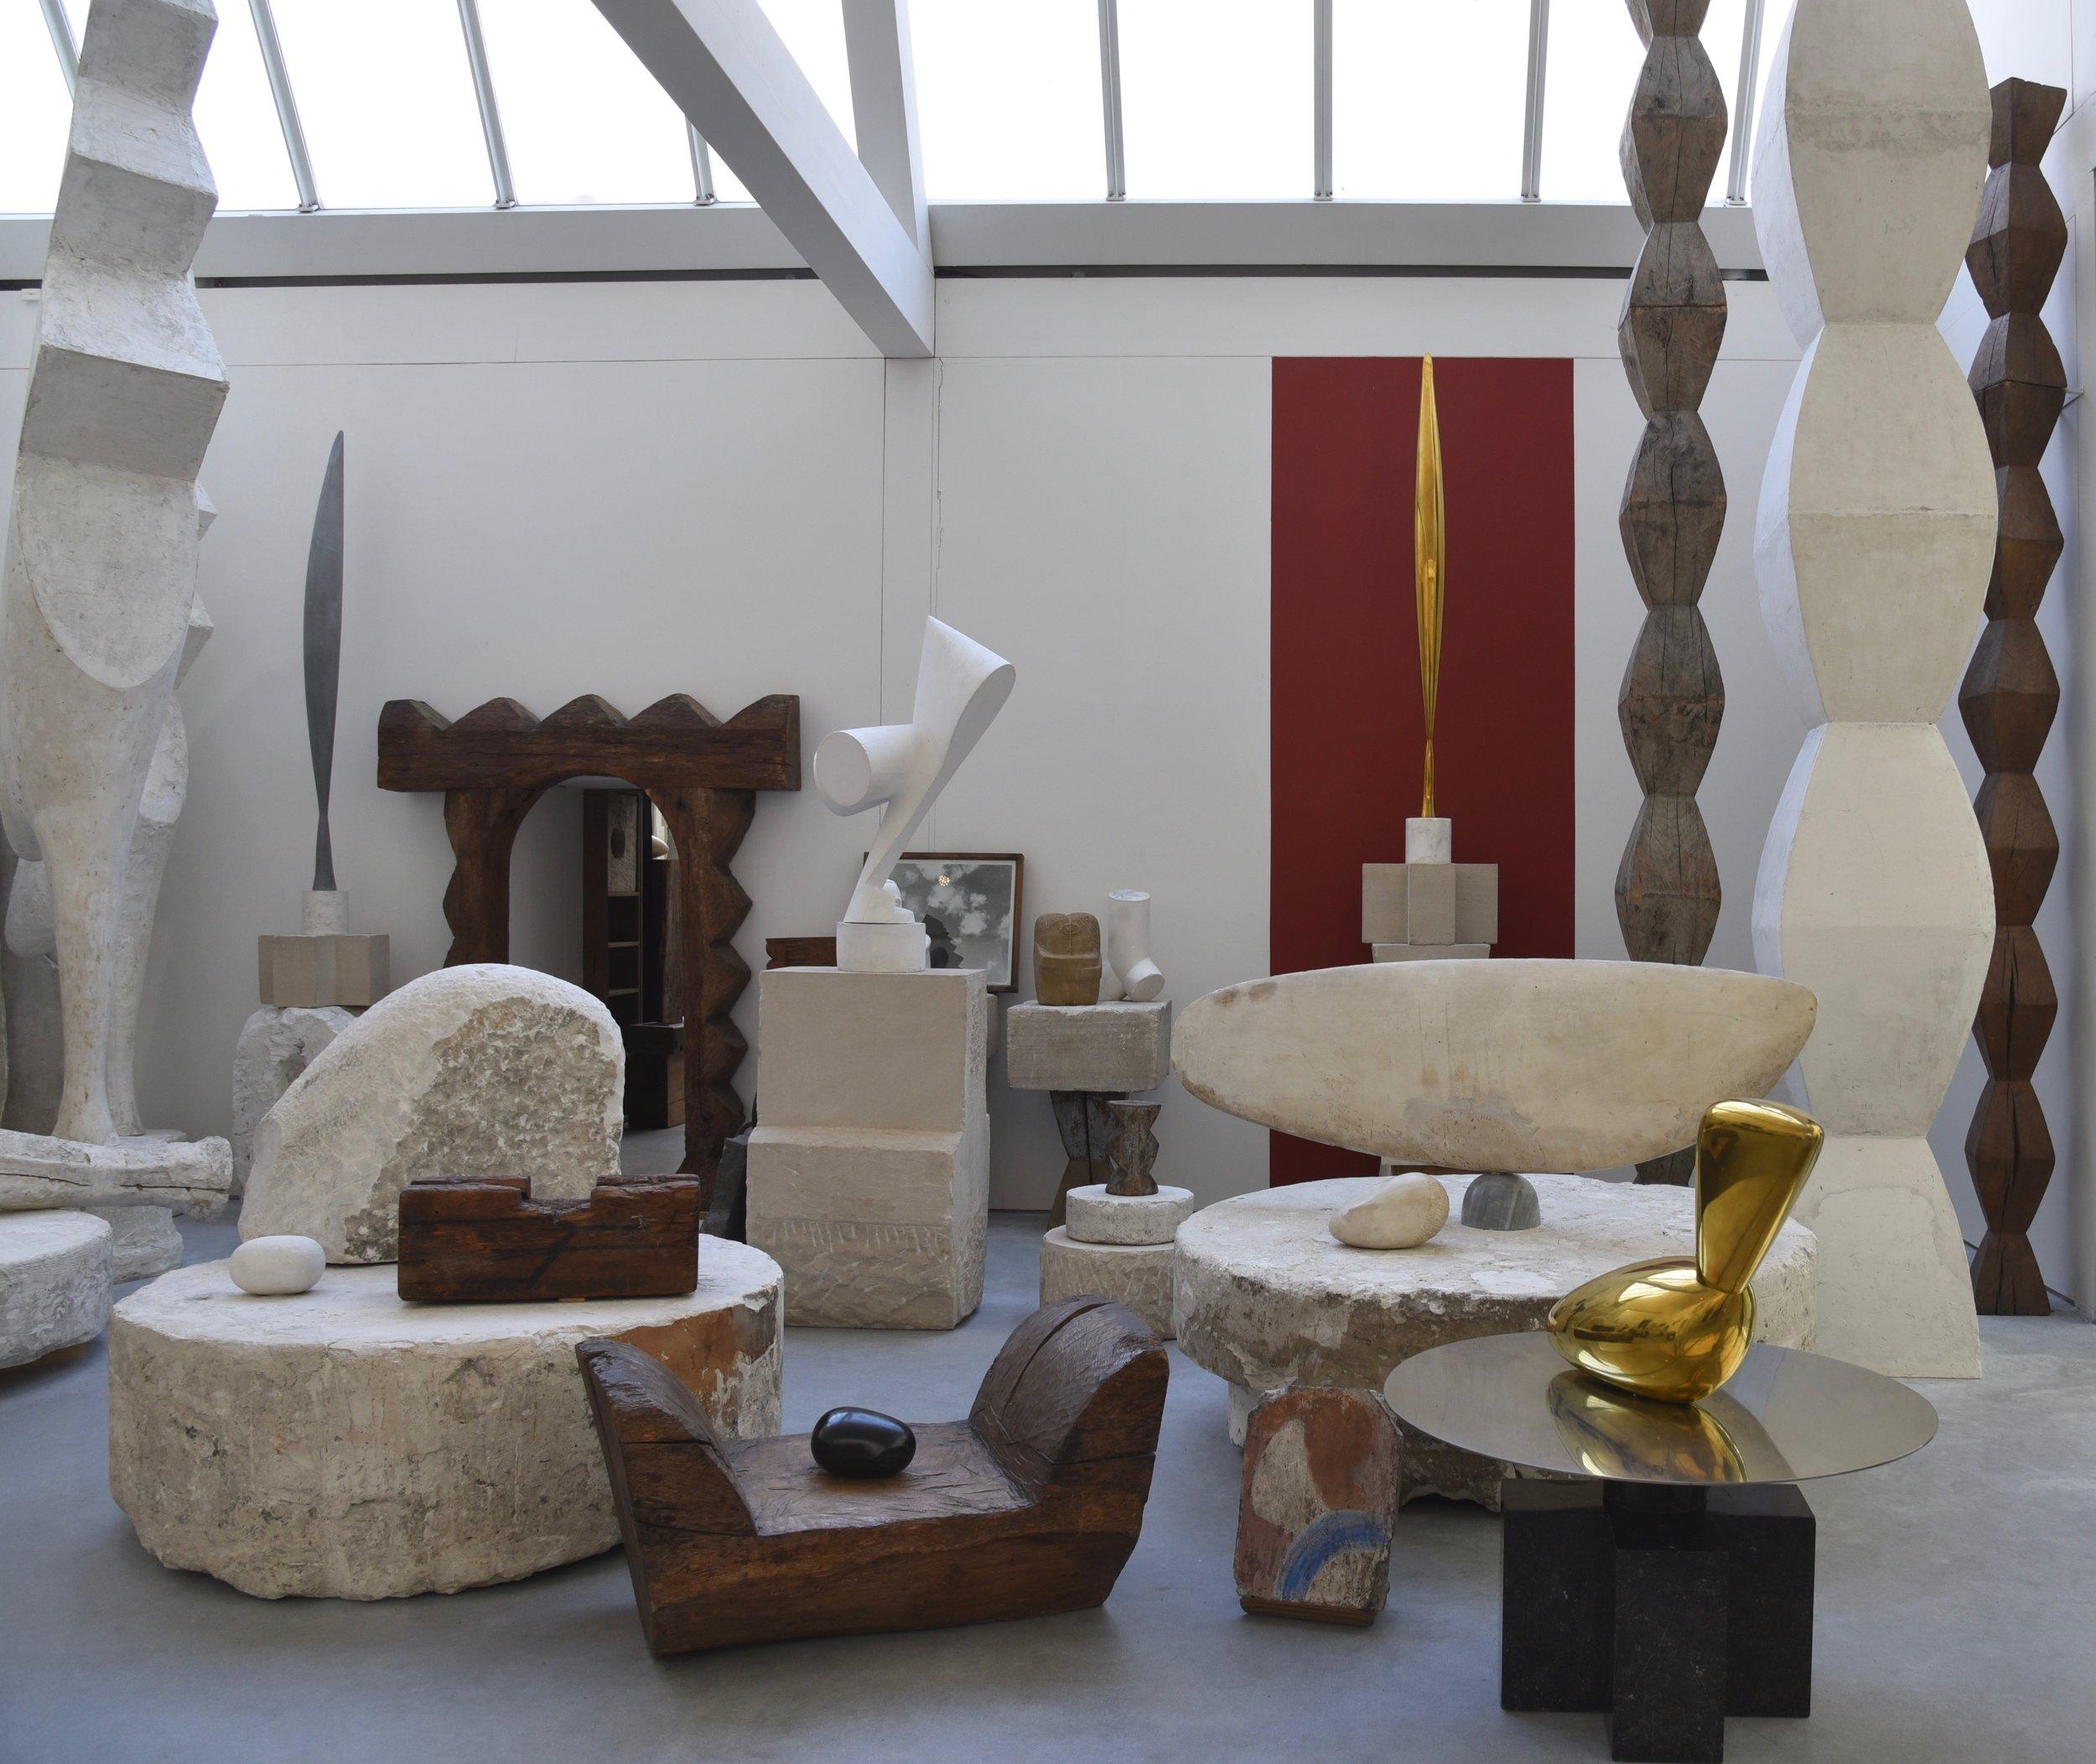 atelier Brancusi reconstruction by renzo piano, paris